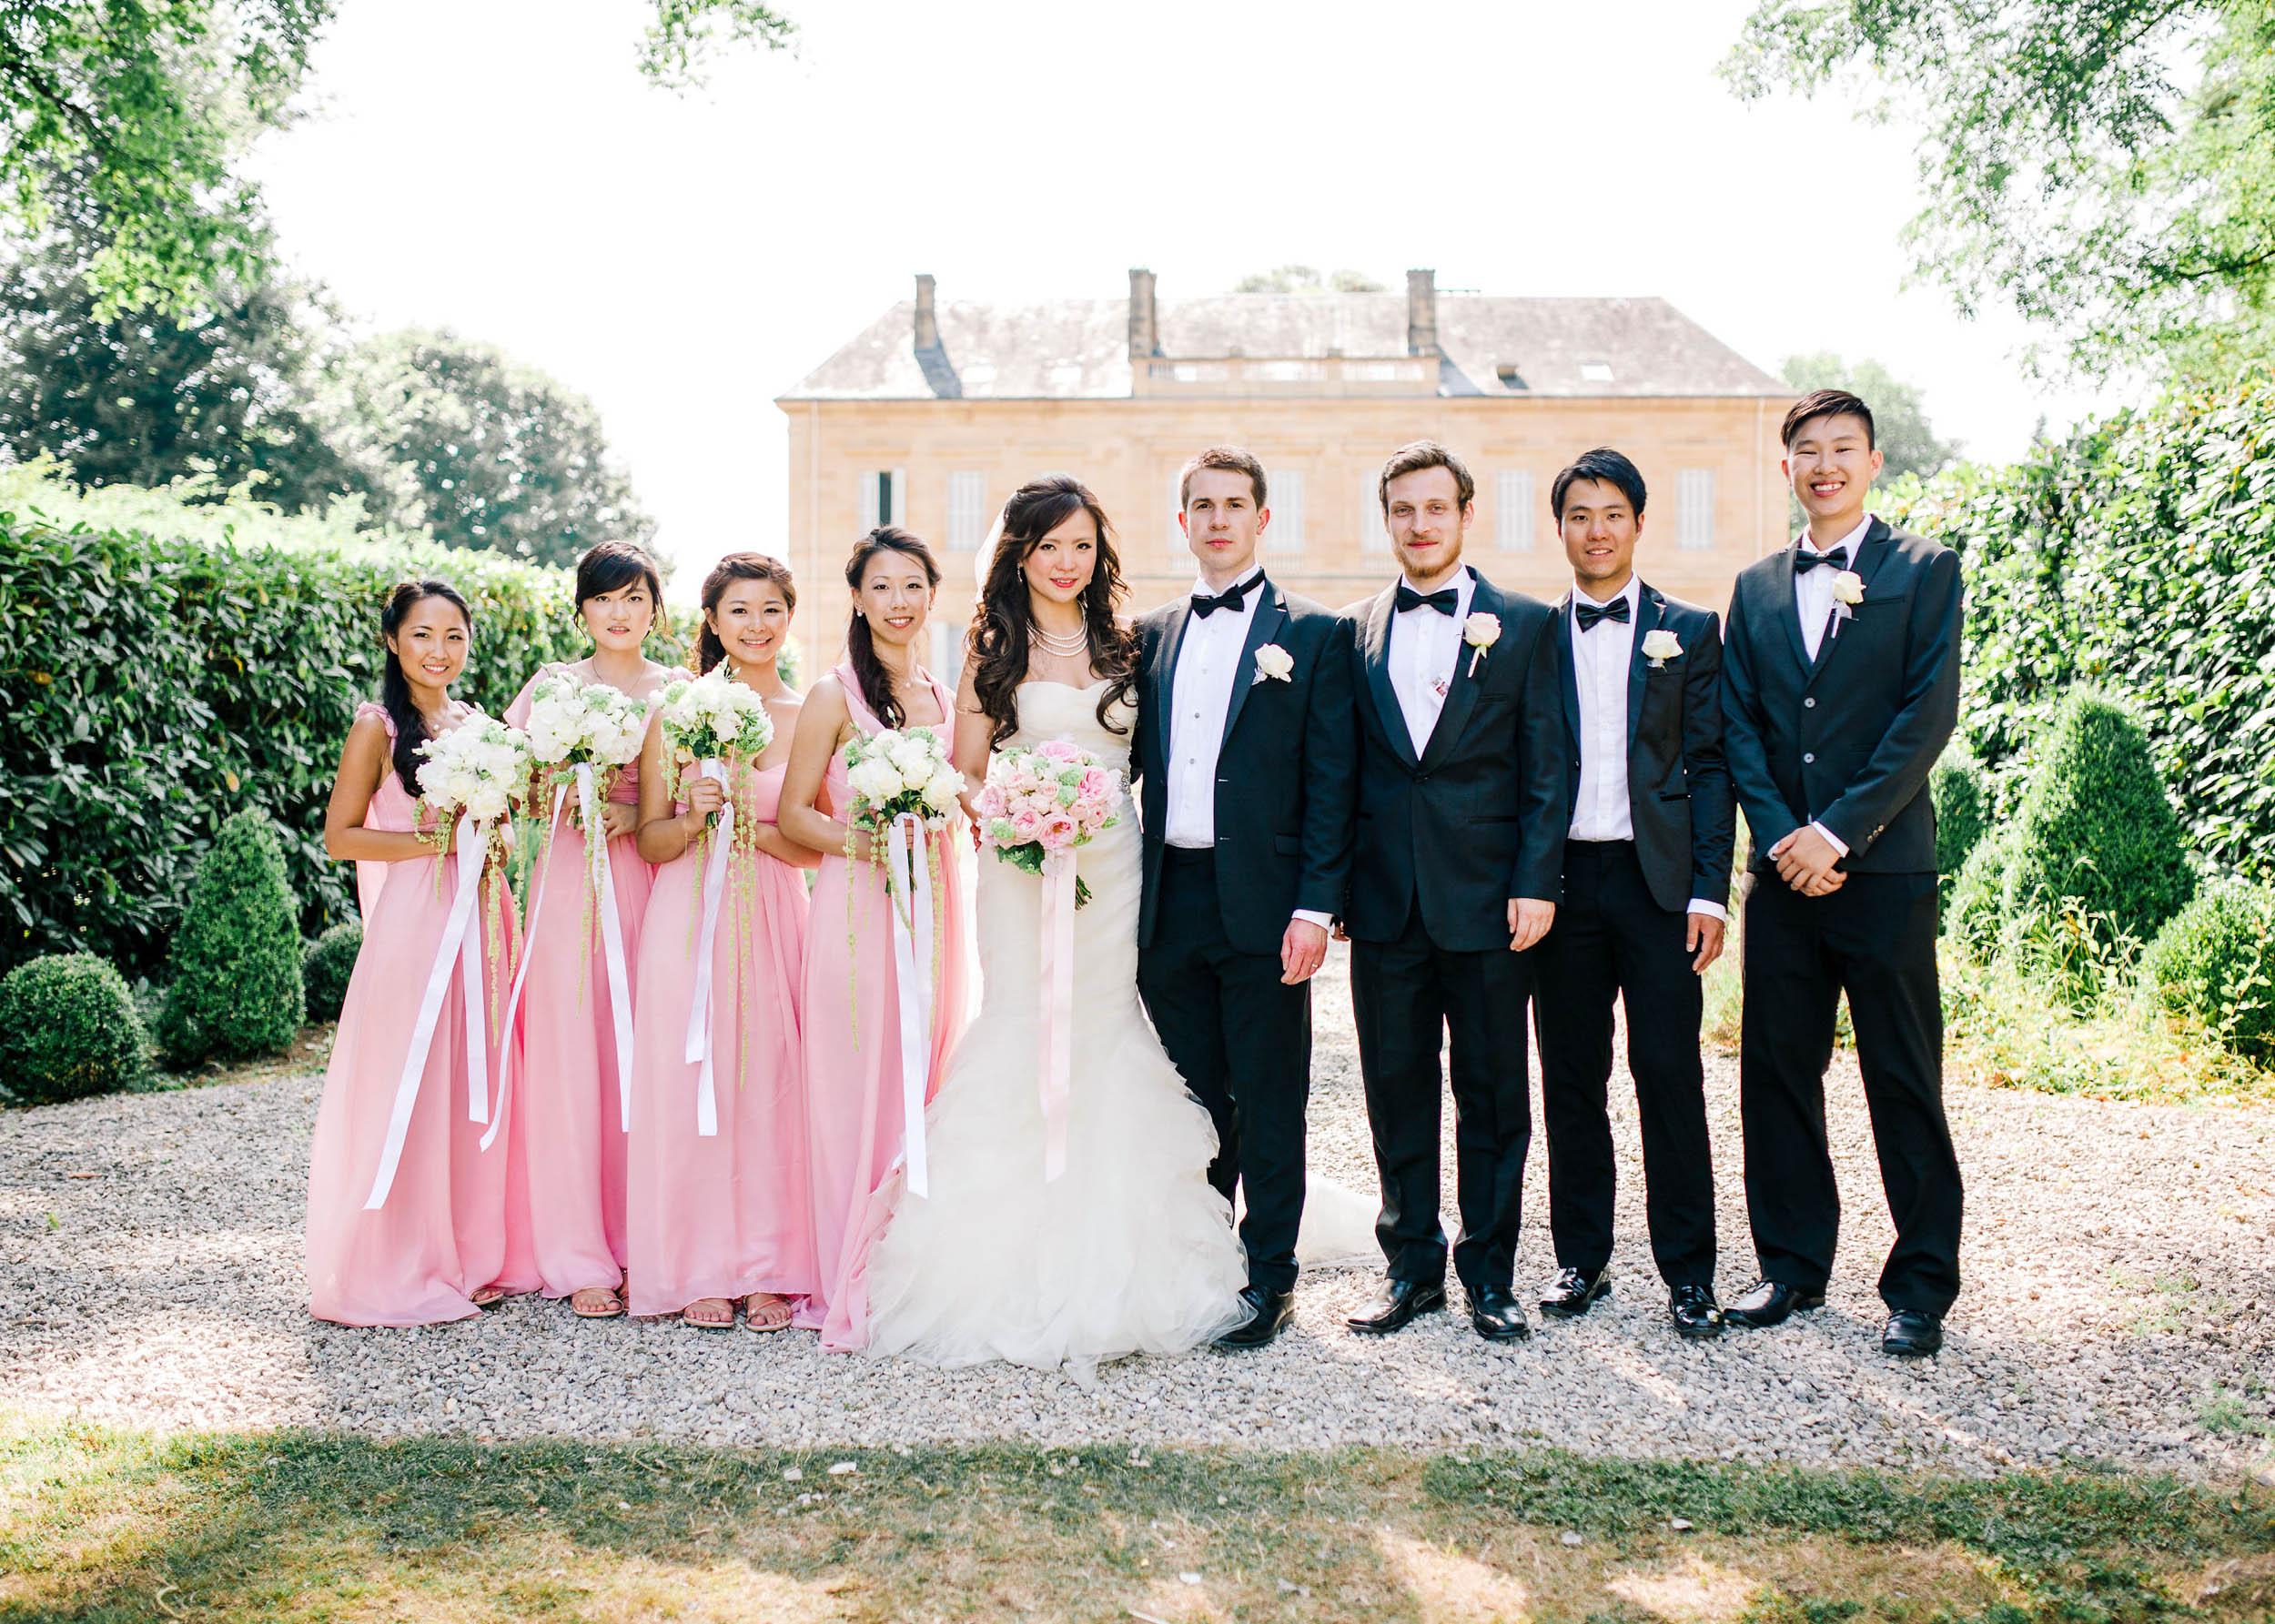 Amy O'Boyle Photography- Destination & UK Fine Art Film Wedding Photographer- Chateau La Durantie Wedding-21.jpg